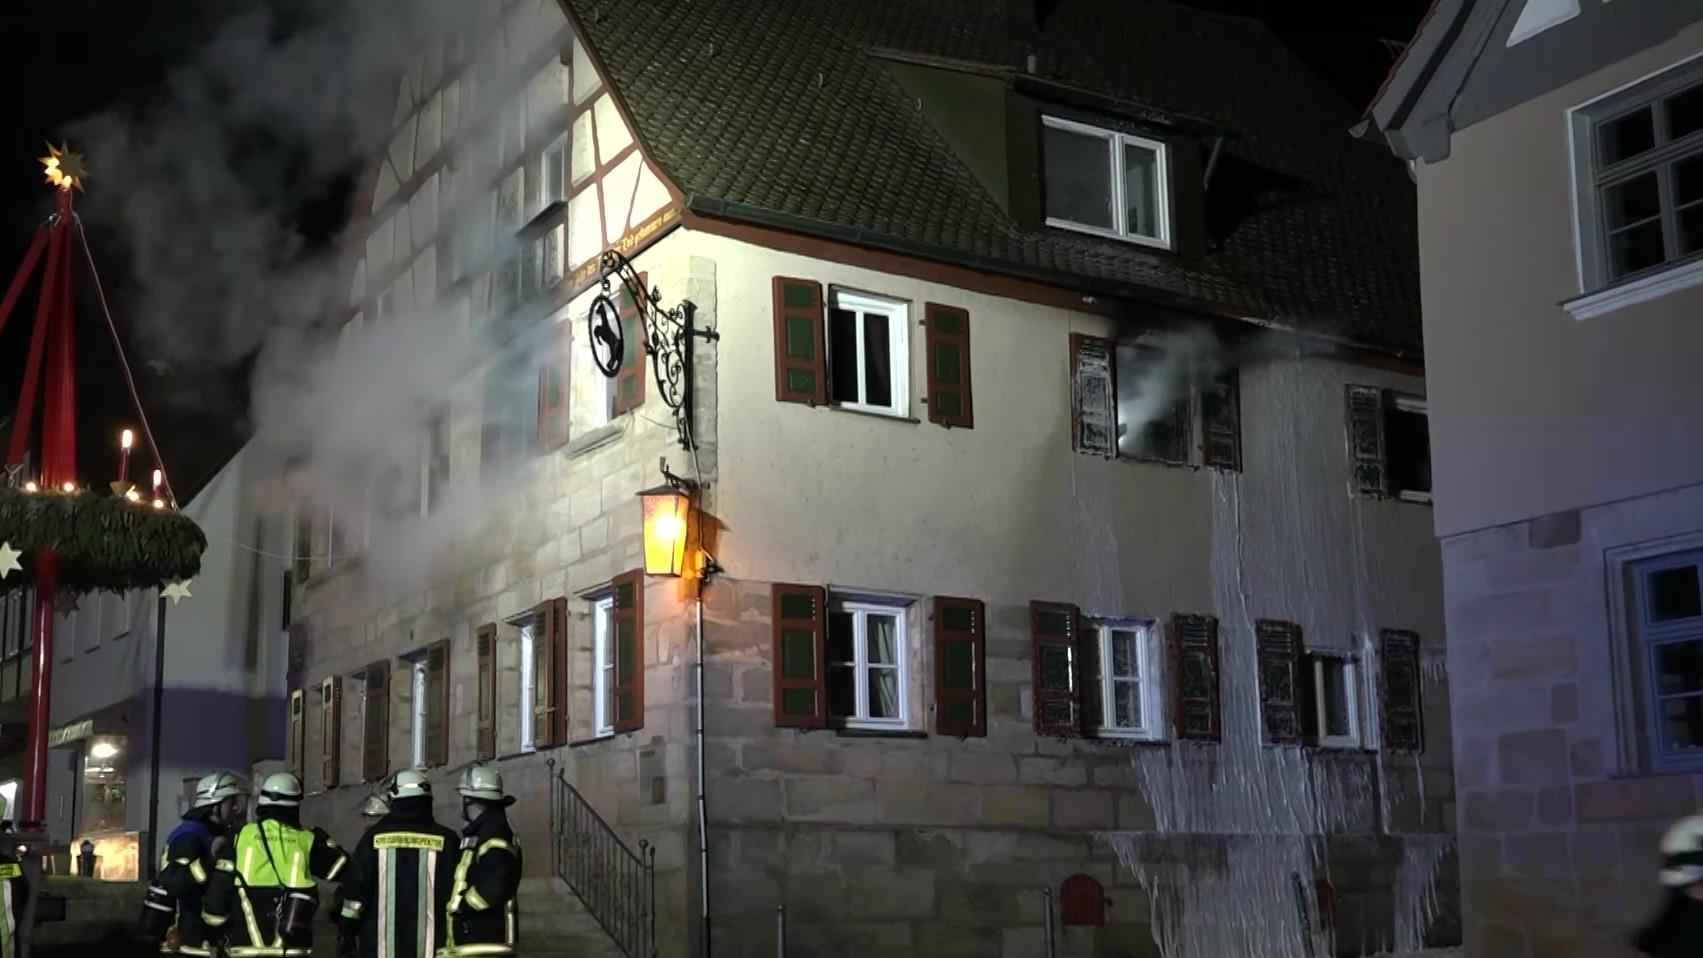 Brennendes Haus in Cadolzburg